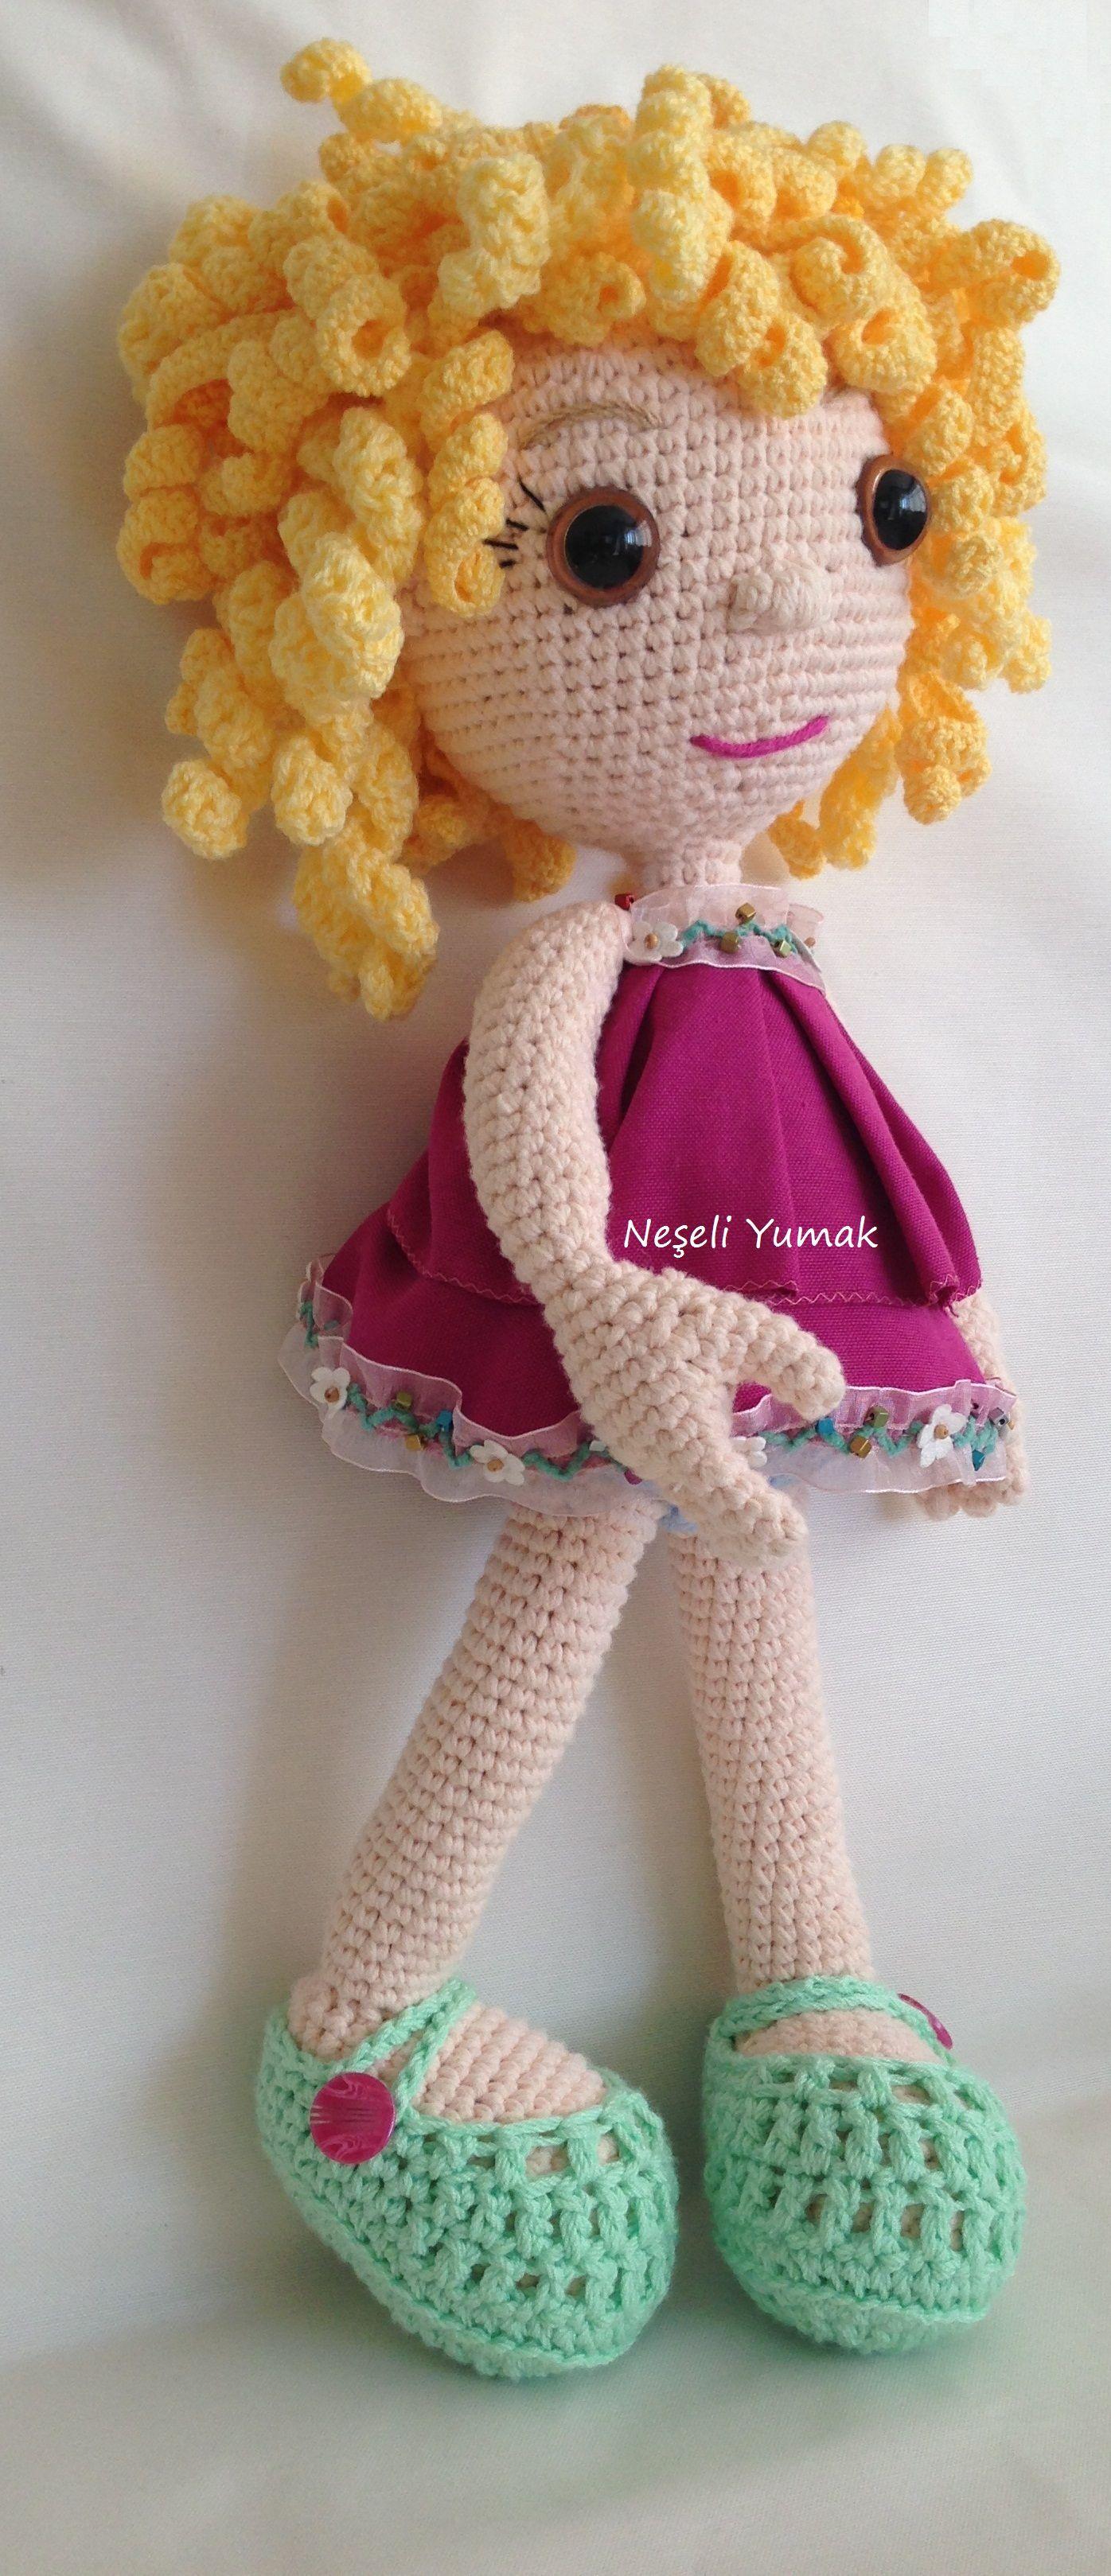 amigurumi doll, crochet, knitting | Knitted Dolls | Pinterest ...